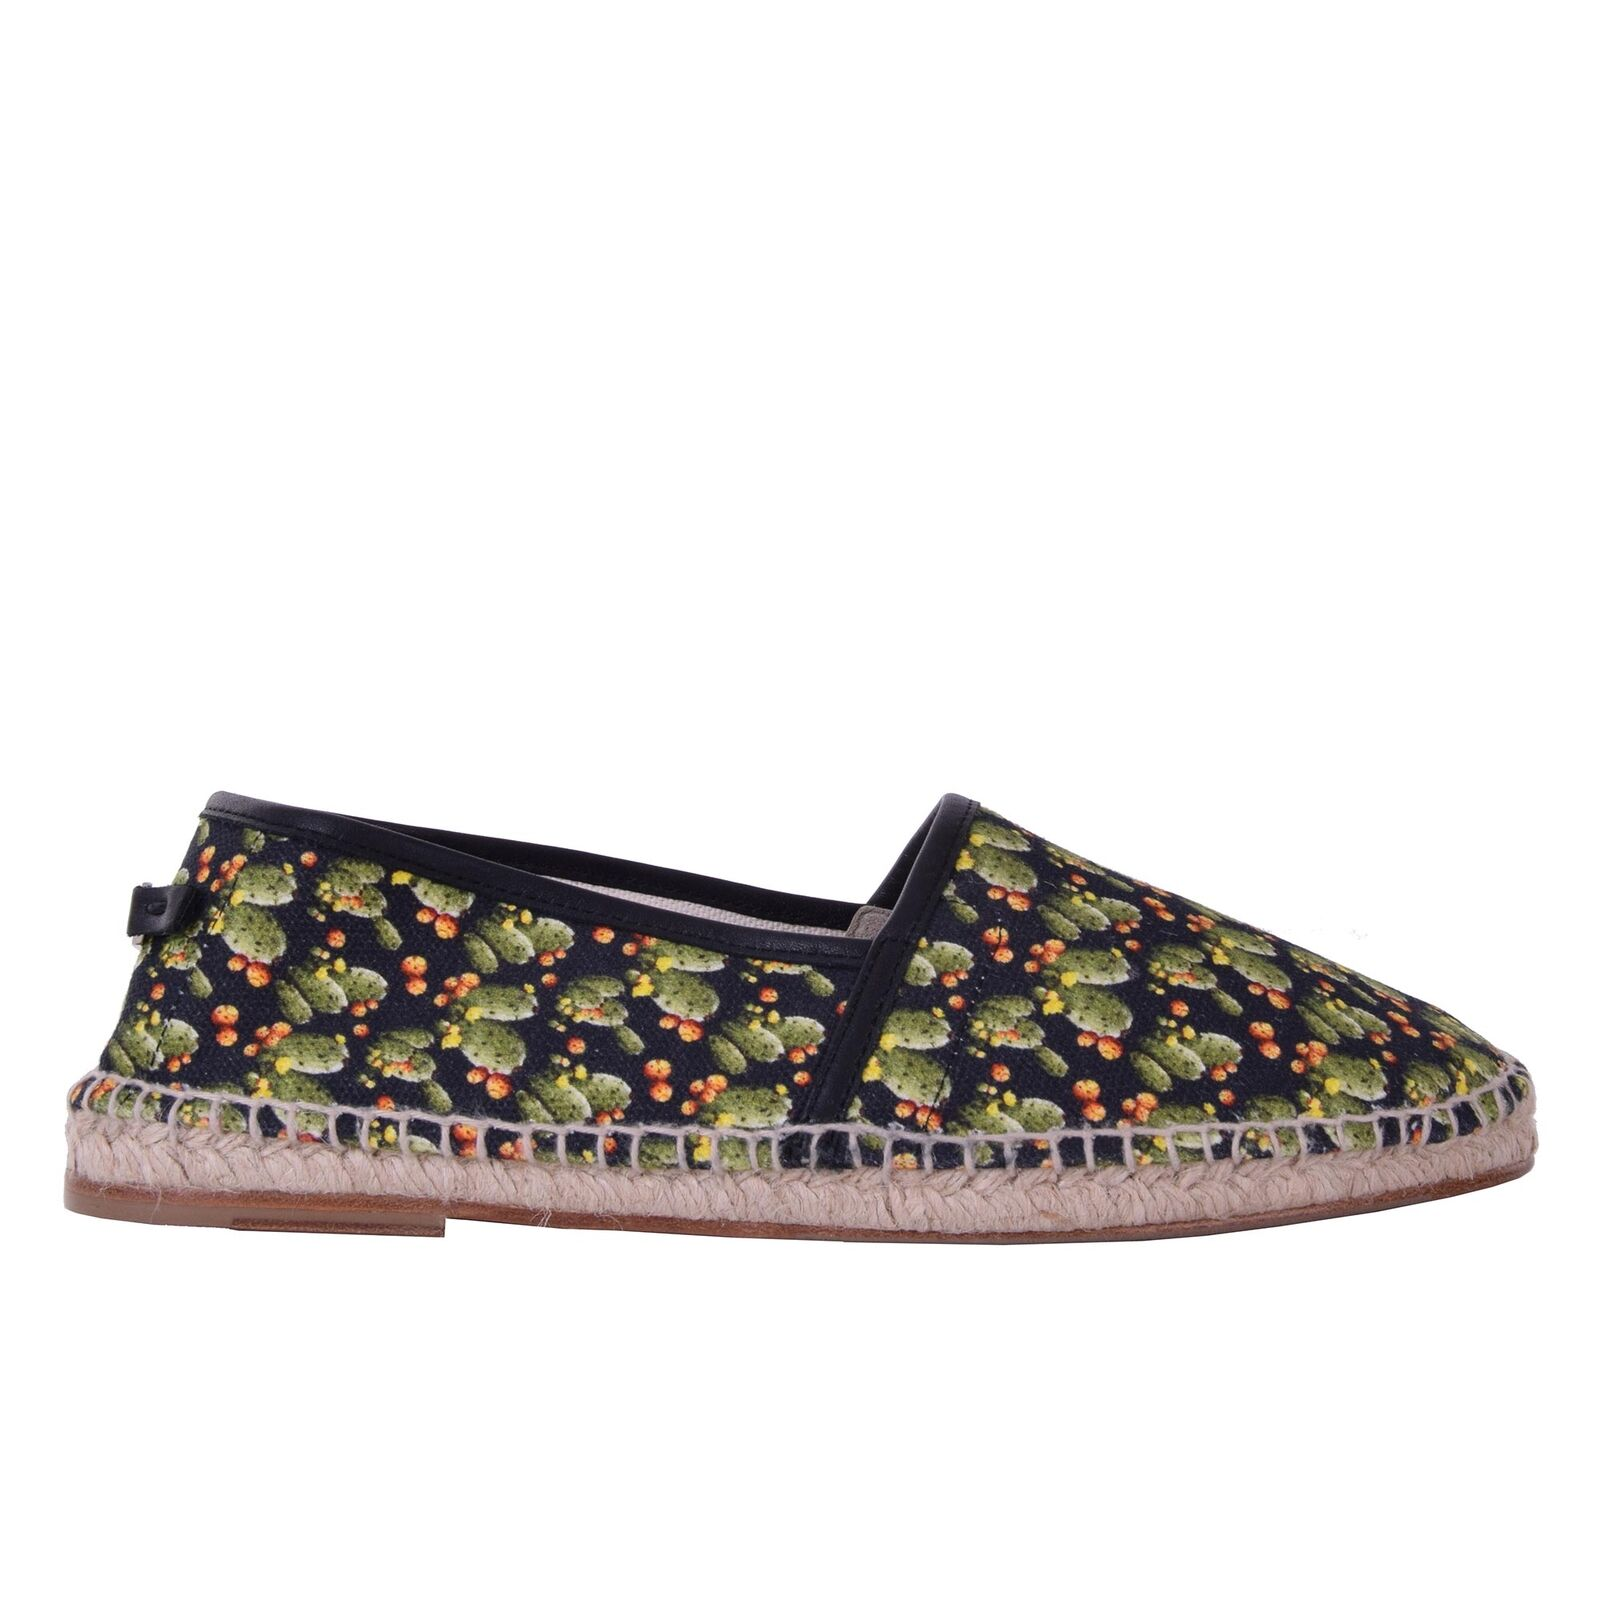 DOLCE & GABBANA Cactus Printed Canvas Espadrilles Shoes TREMITI Black 06235